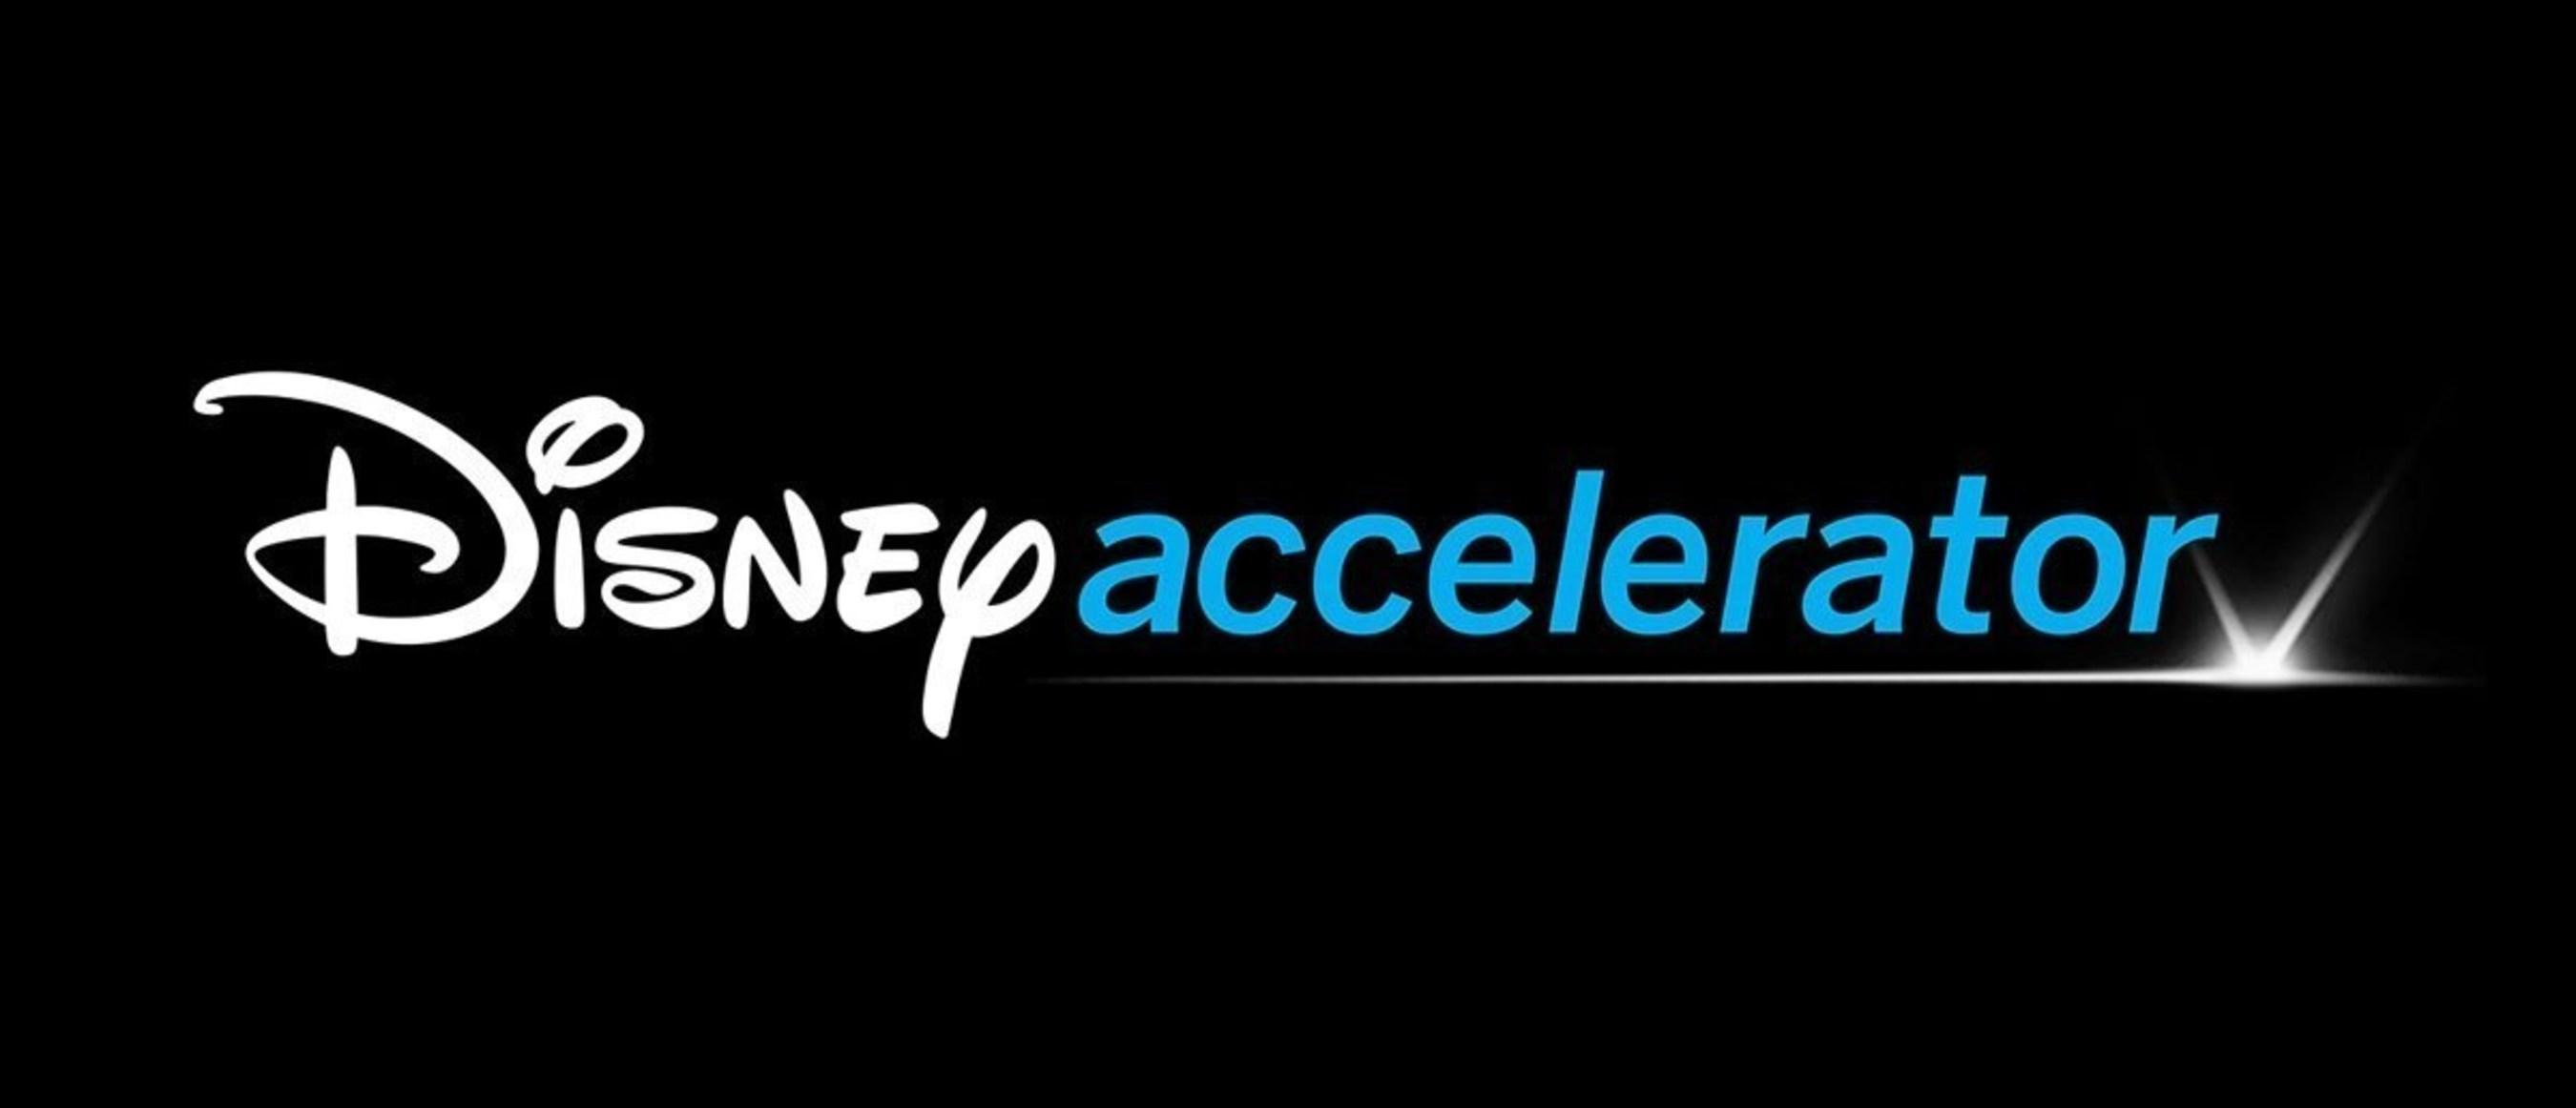 Disney Accelerator Showcases 10 Promising Start-Ups At Demo Day